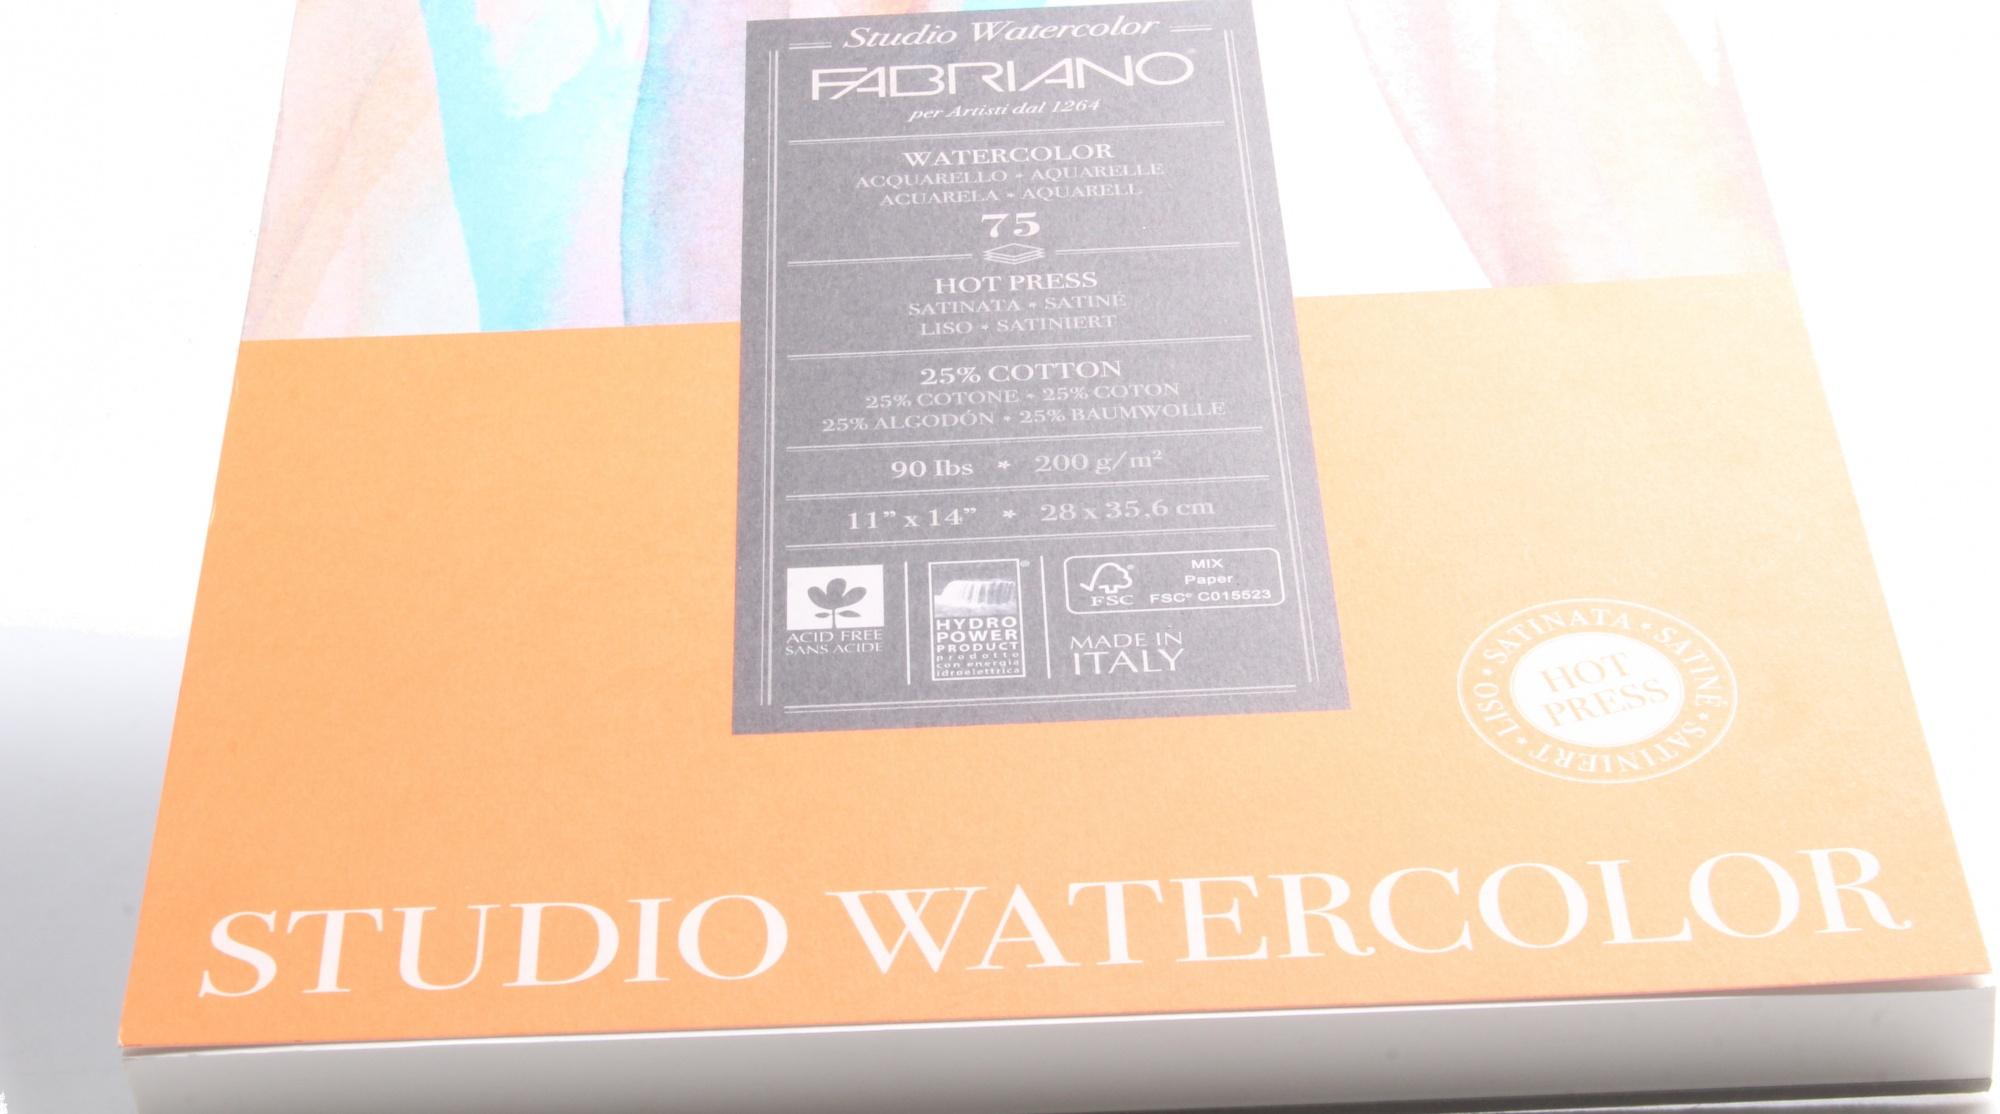 Fabriano Studio Watercolour Paper 90 lb  Hot Press 75-Sheet Pad 28cm x 36cm